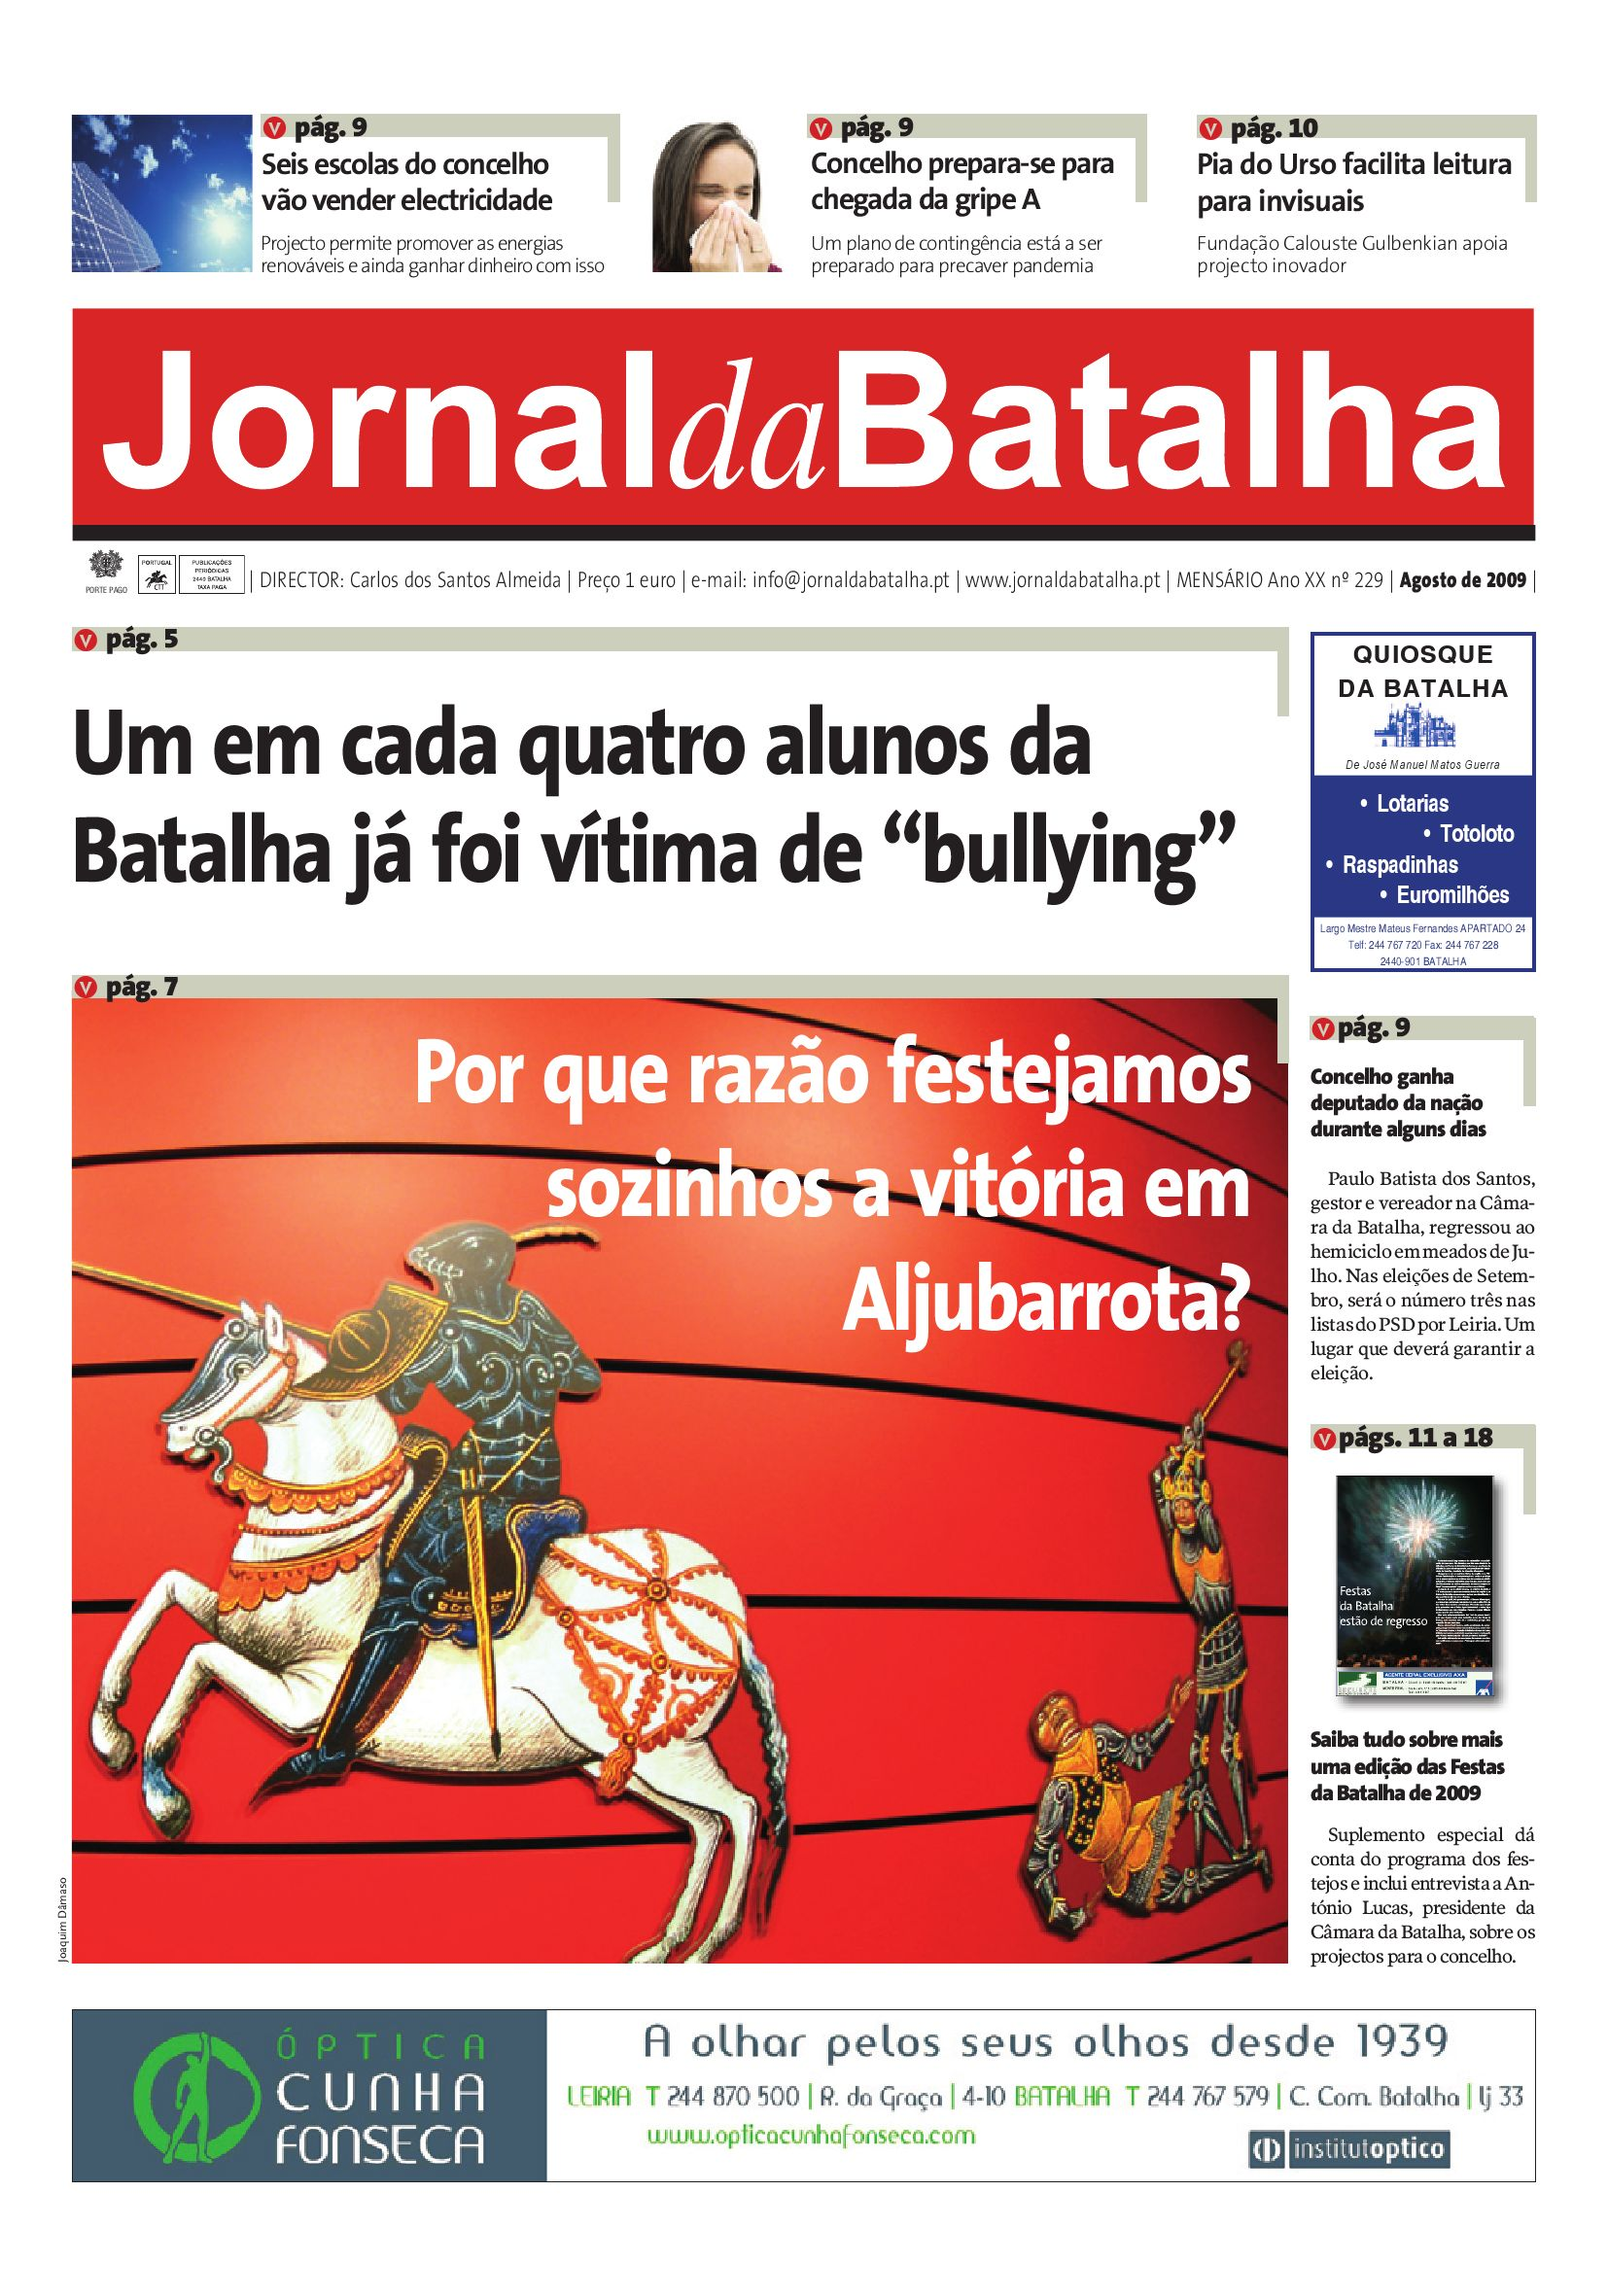 Jornal da Batalha Agosto de 2009 by Jornal Batalha - issuu 3a5b4f0c4da97